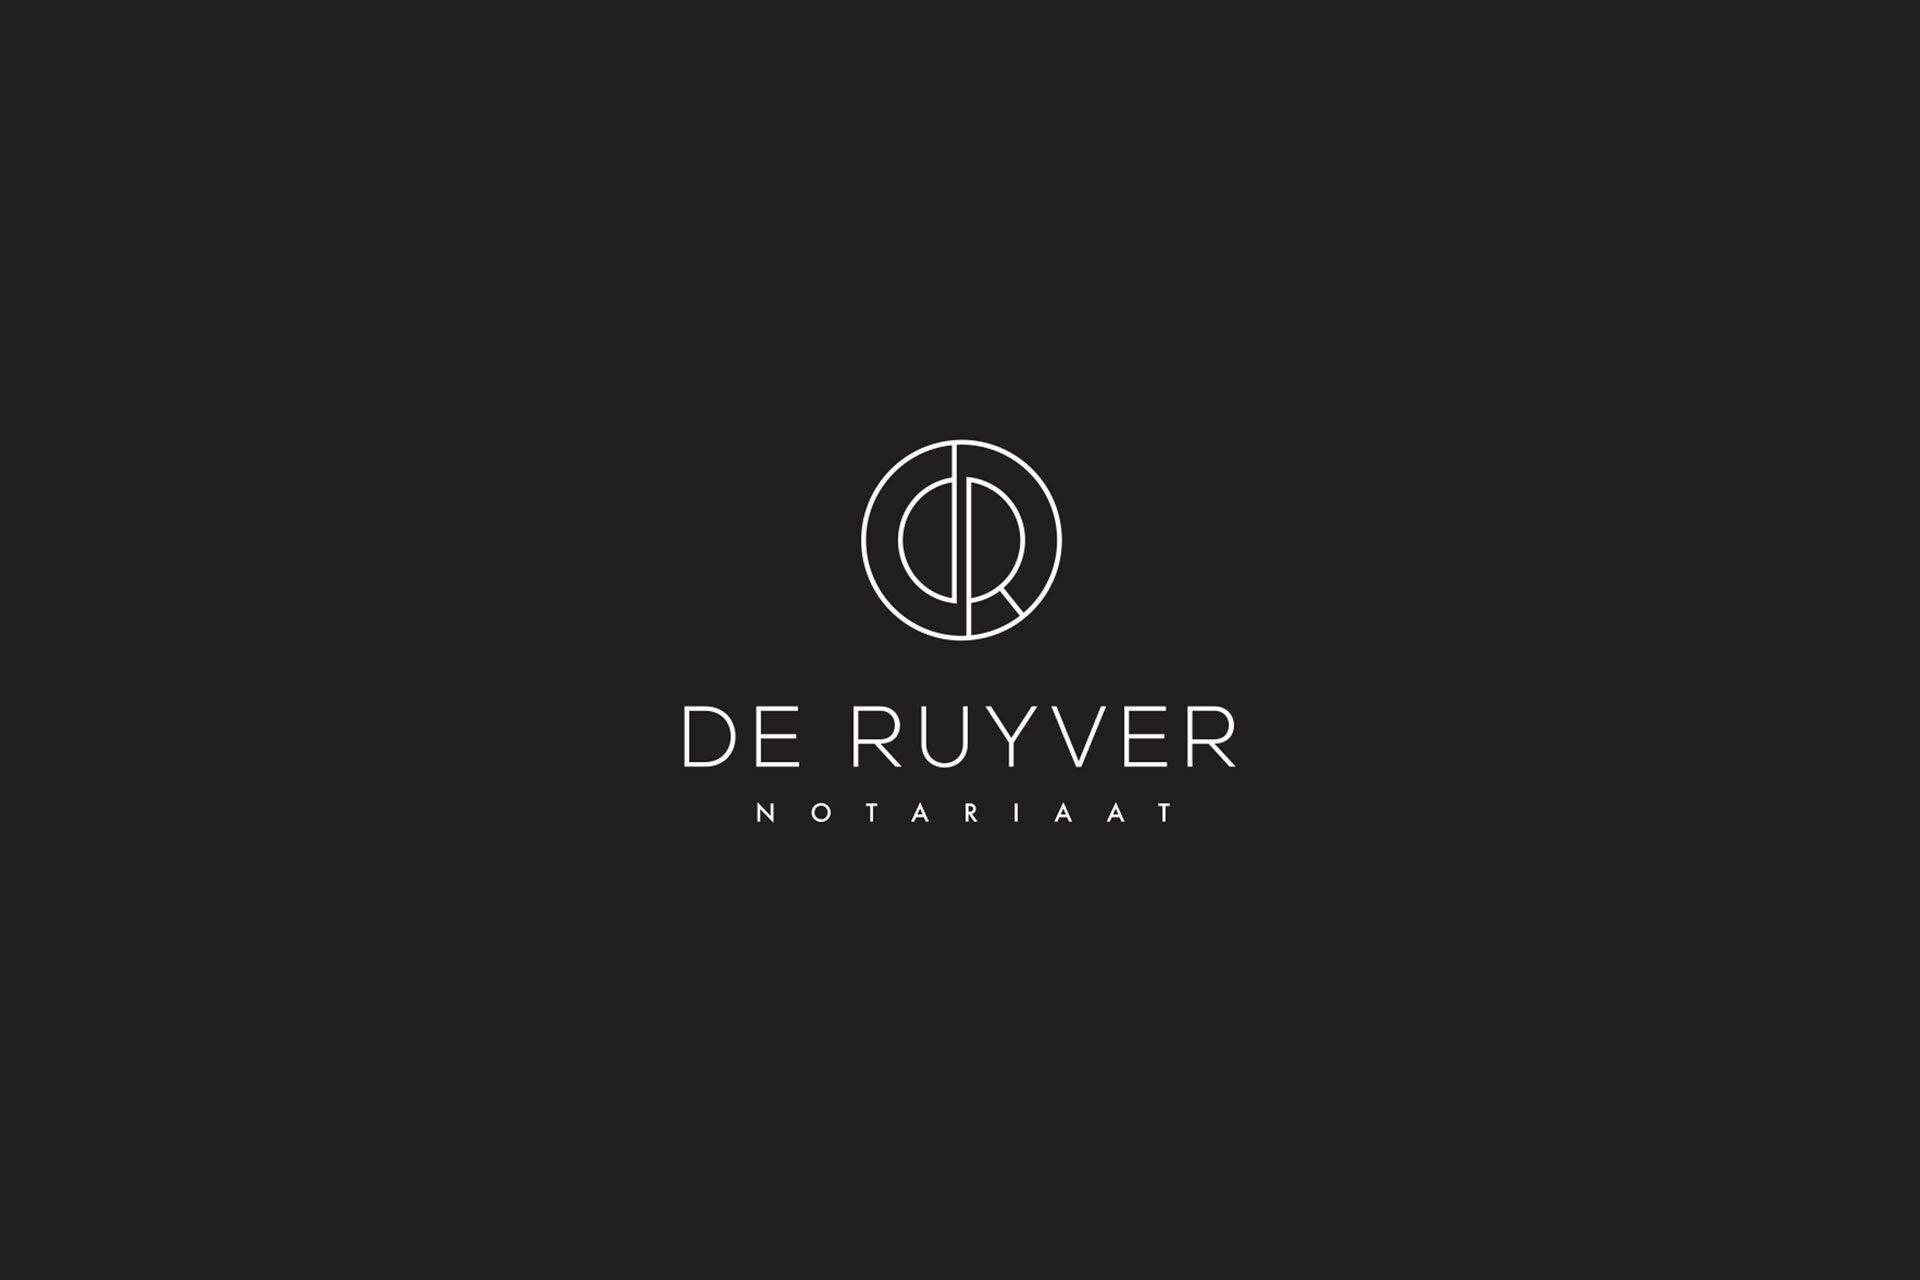 Afbeelding De Ruyver Brand Identity